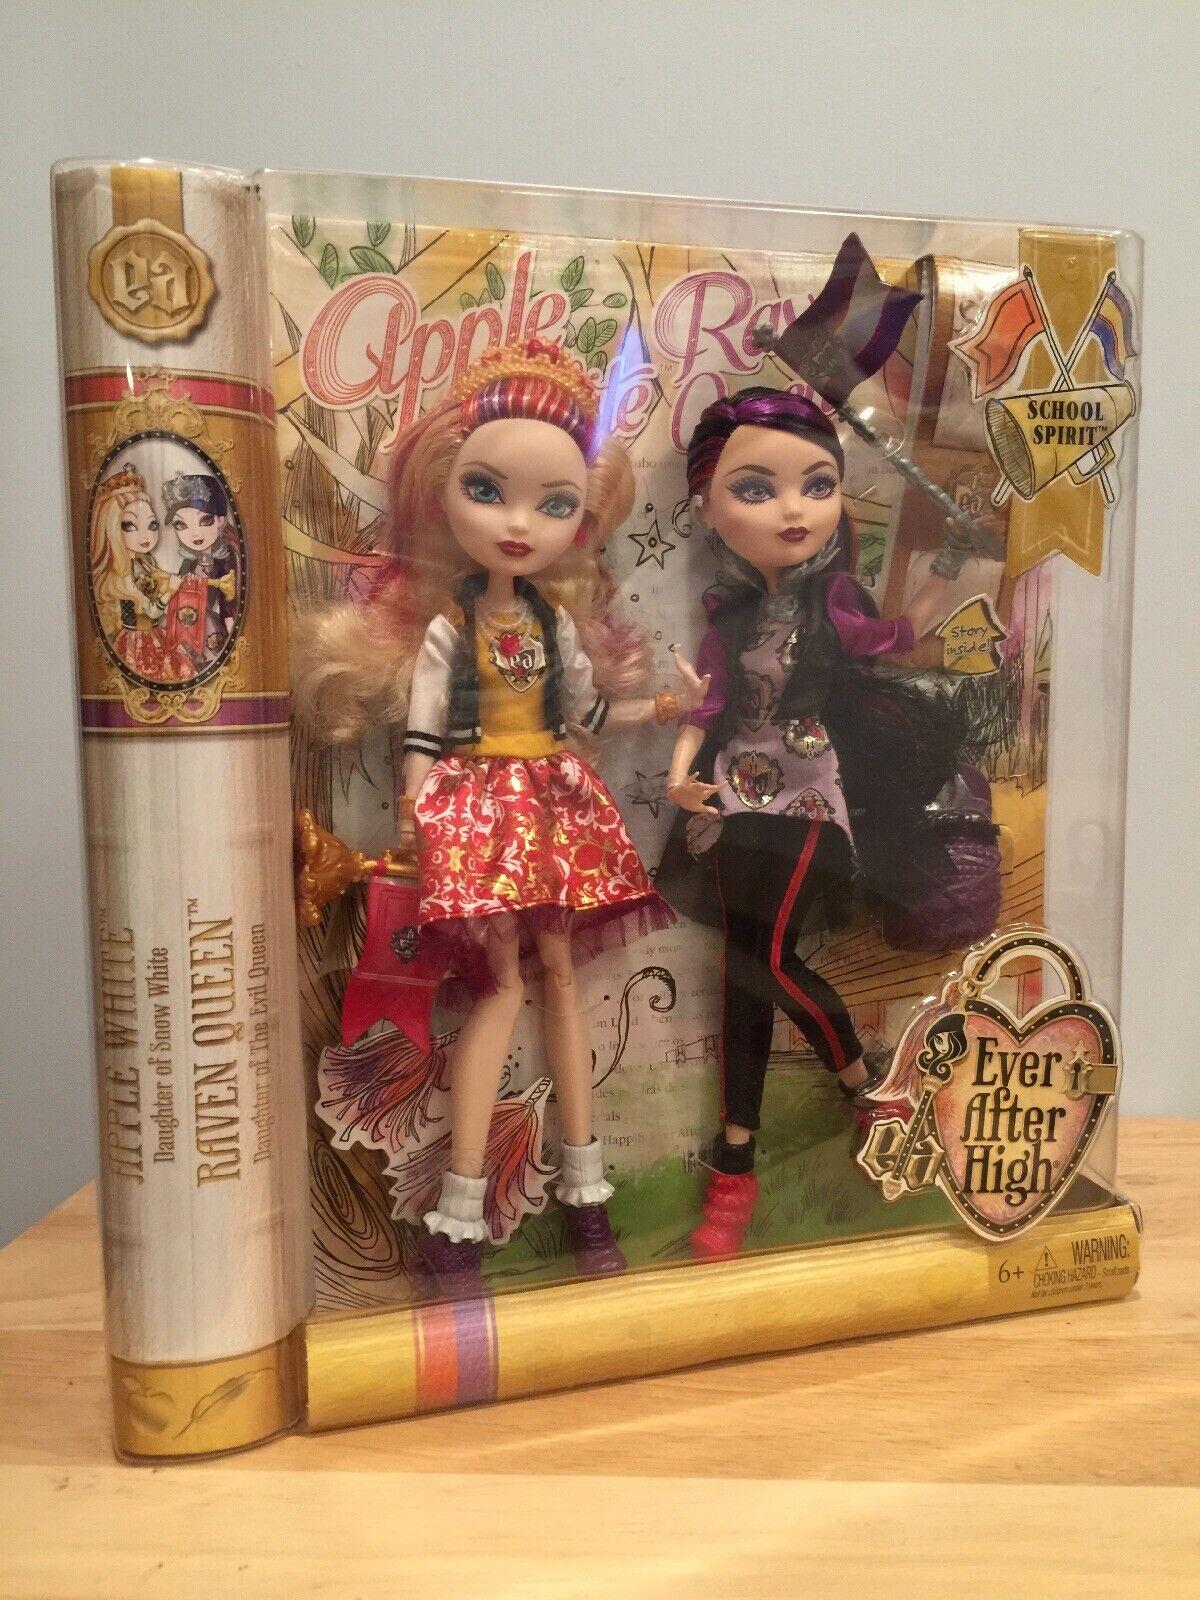 NIB EVER AFTER HIGH Apple Weiß & Raven Queen School Spirit Dolls set